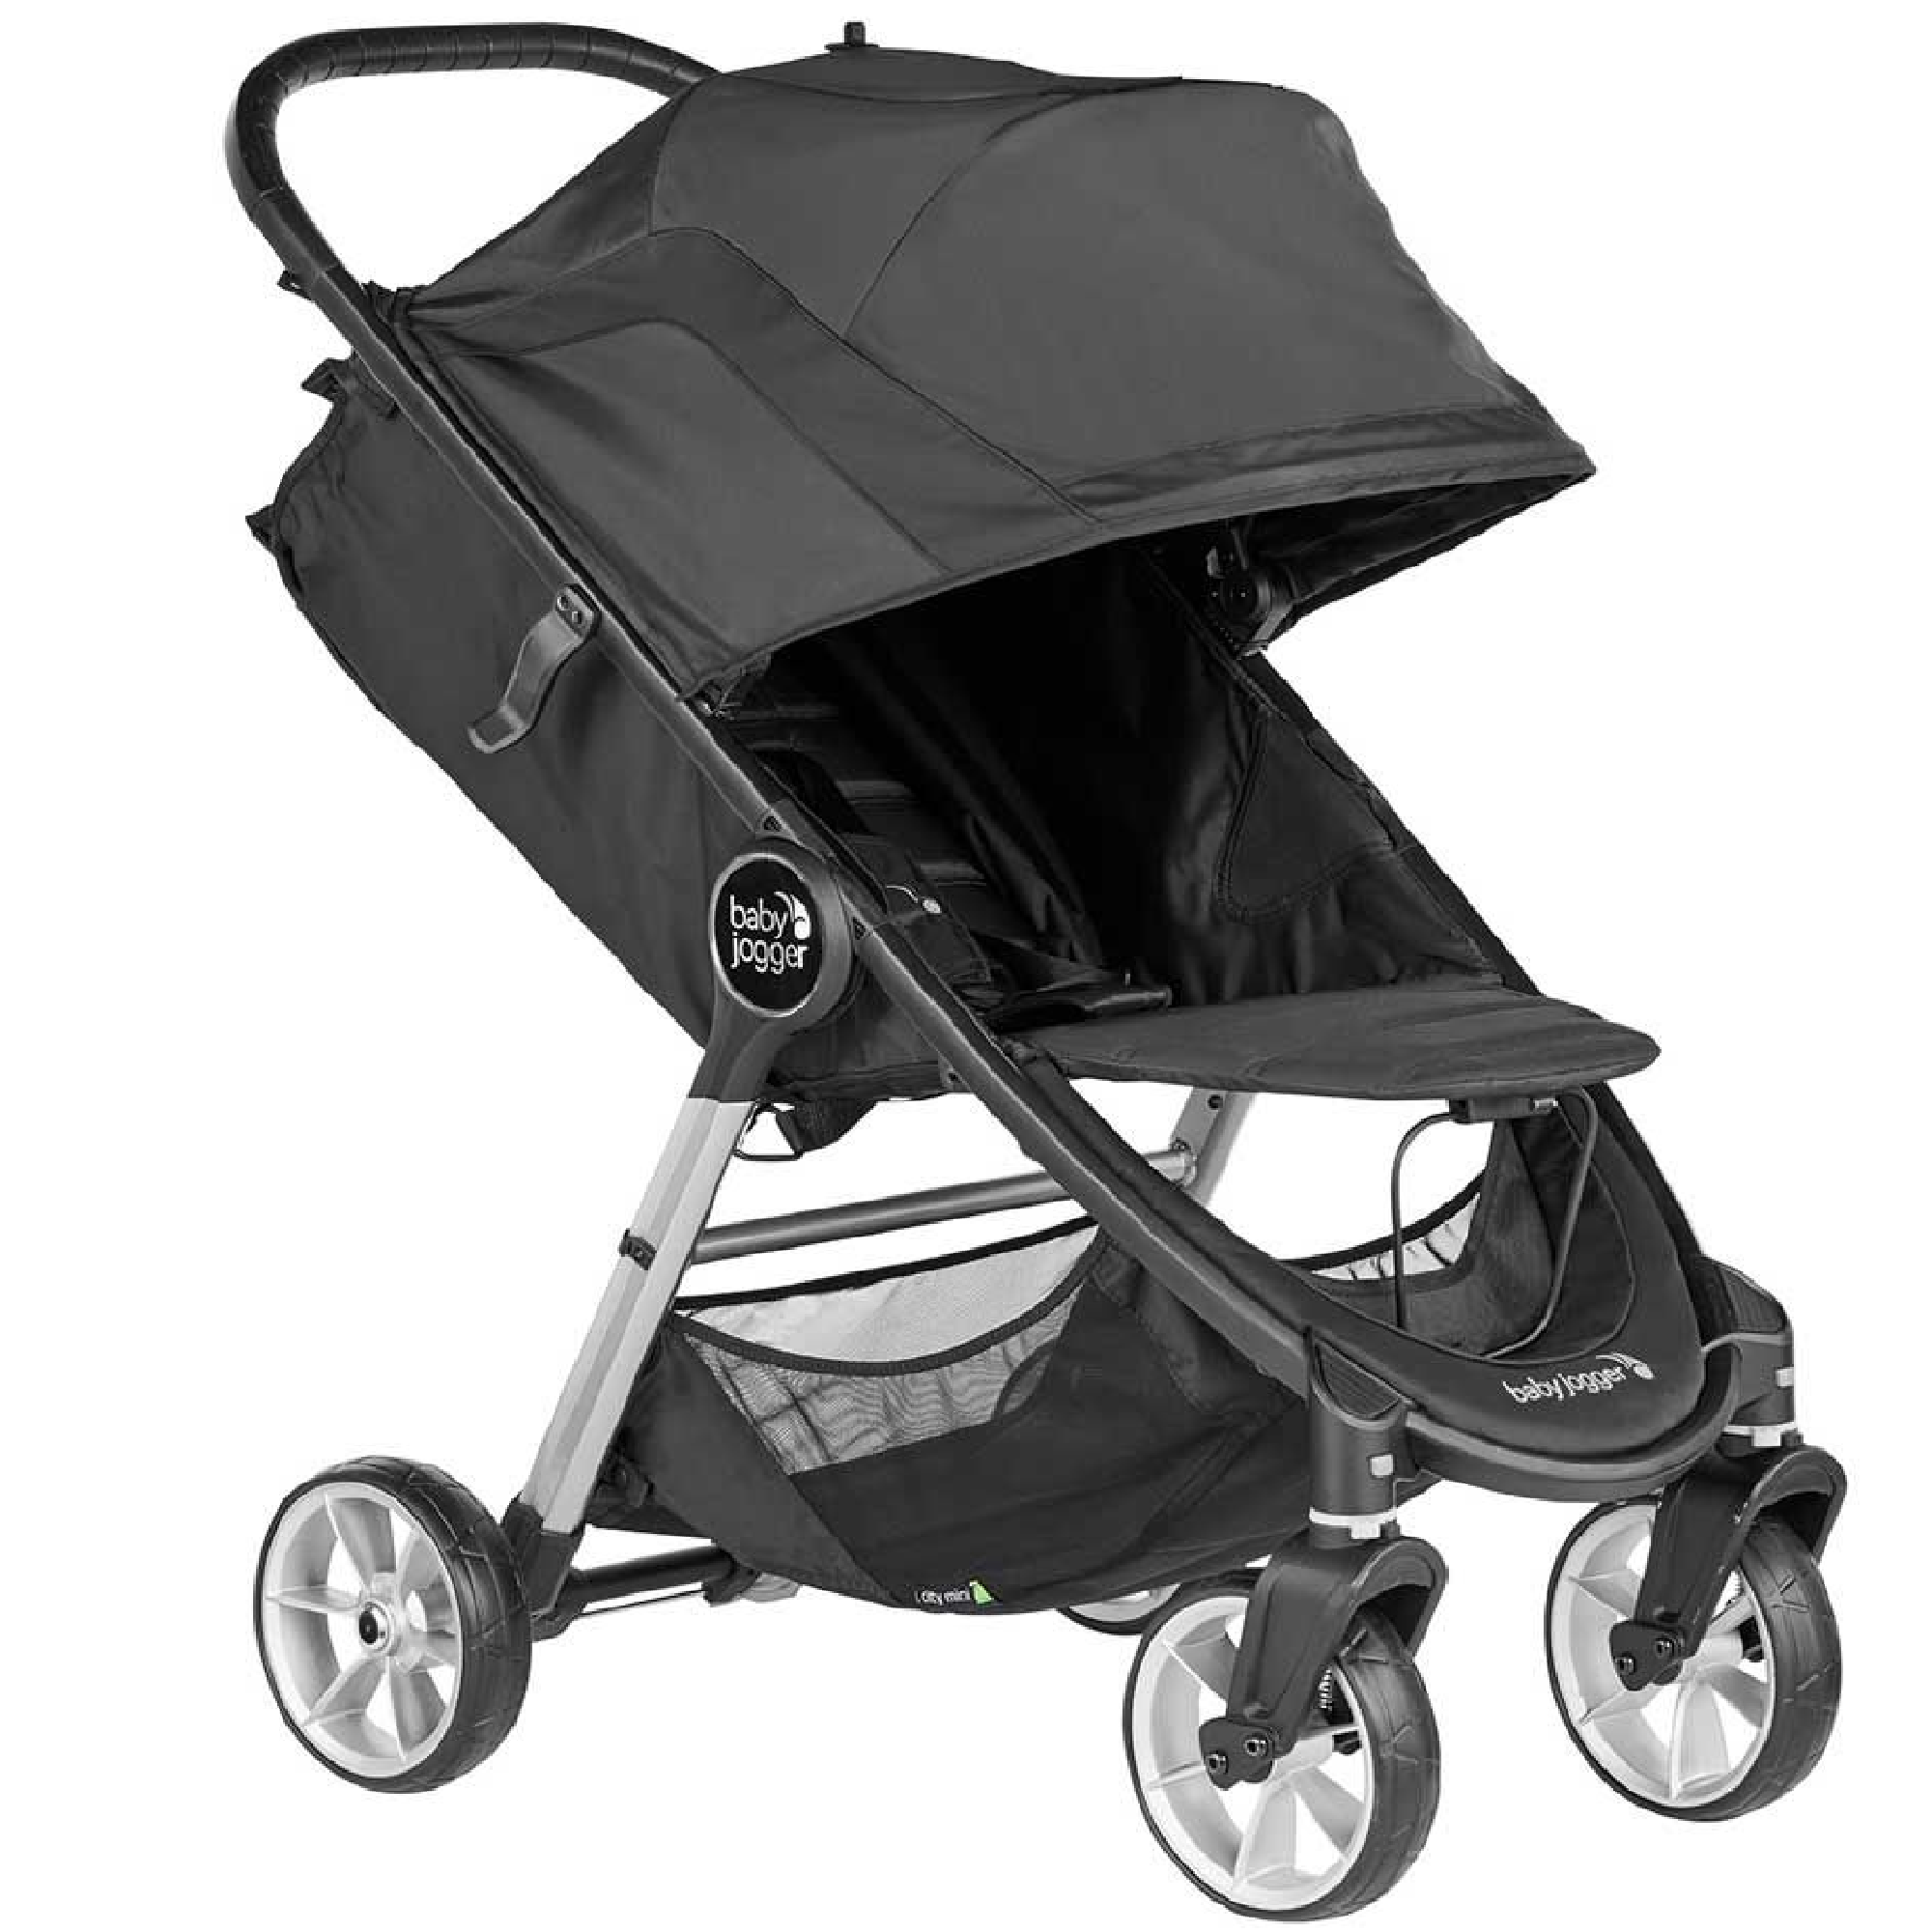 Baby Jogger City Mini2 4 Wheel-Jet - Baby and Child Store